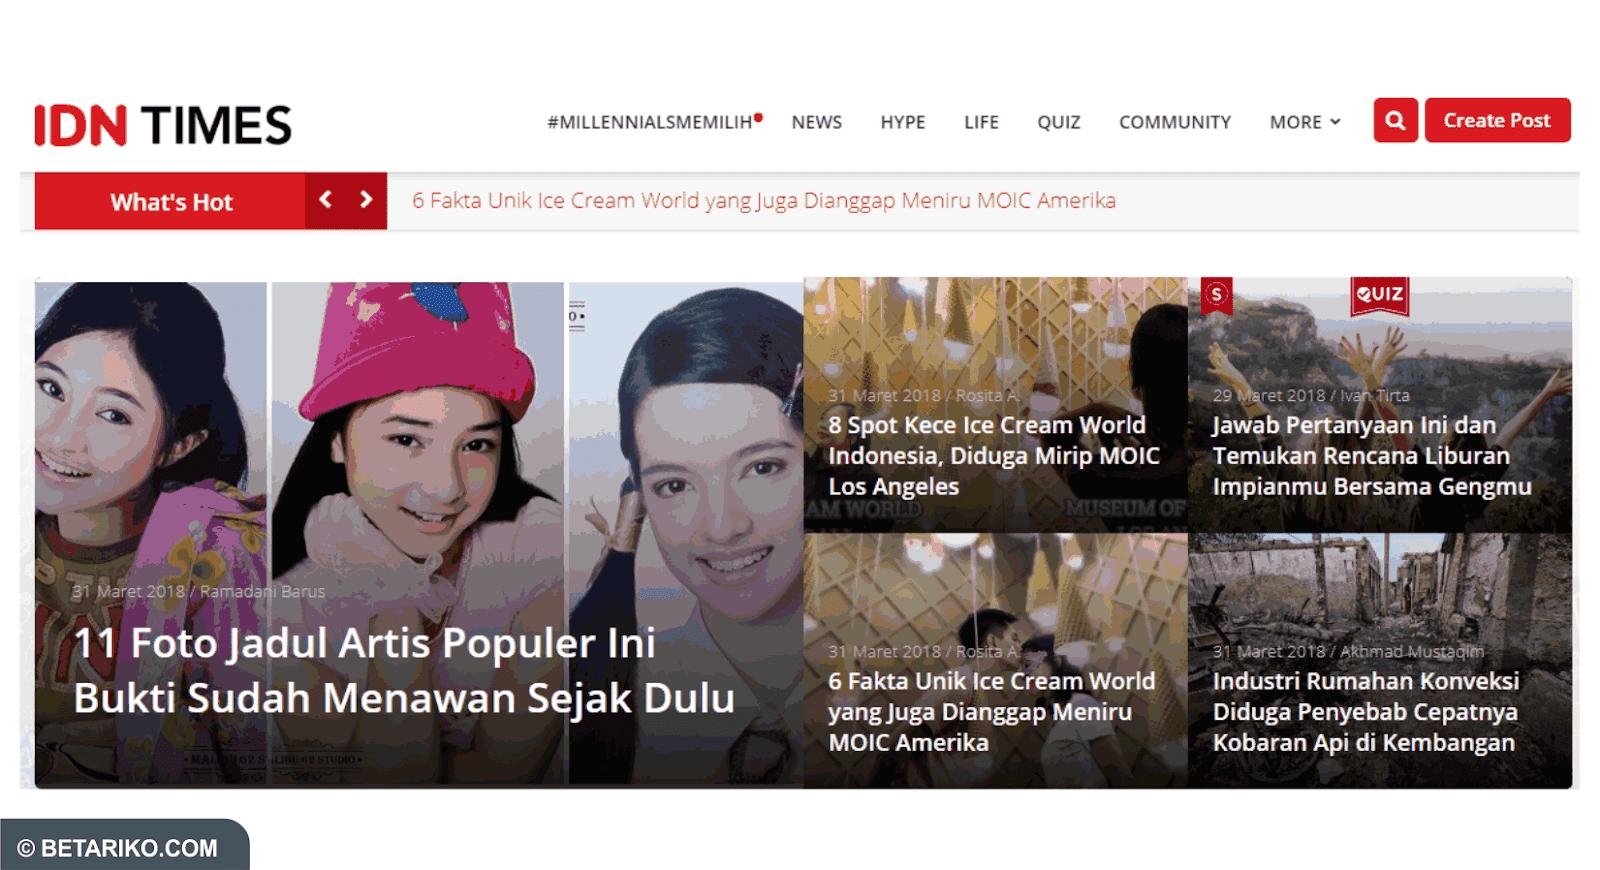 Ulasan Singkat IDN Times Situs Berita Generasi Millenials